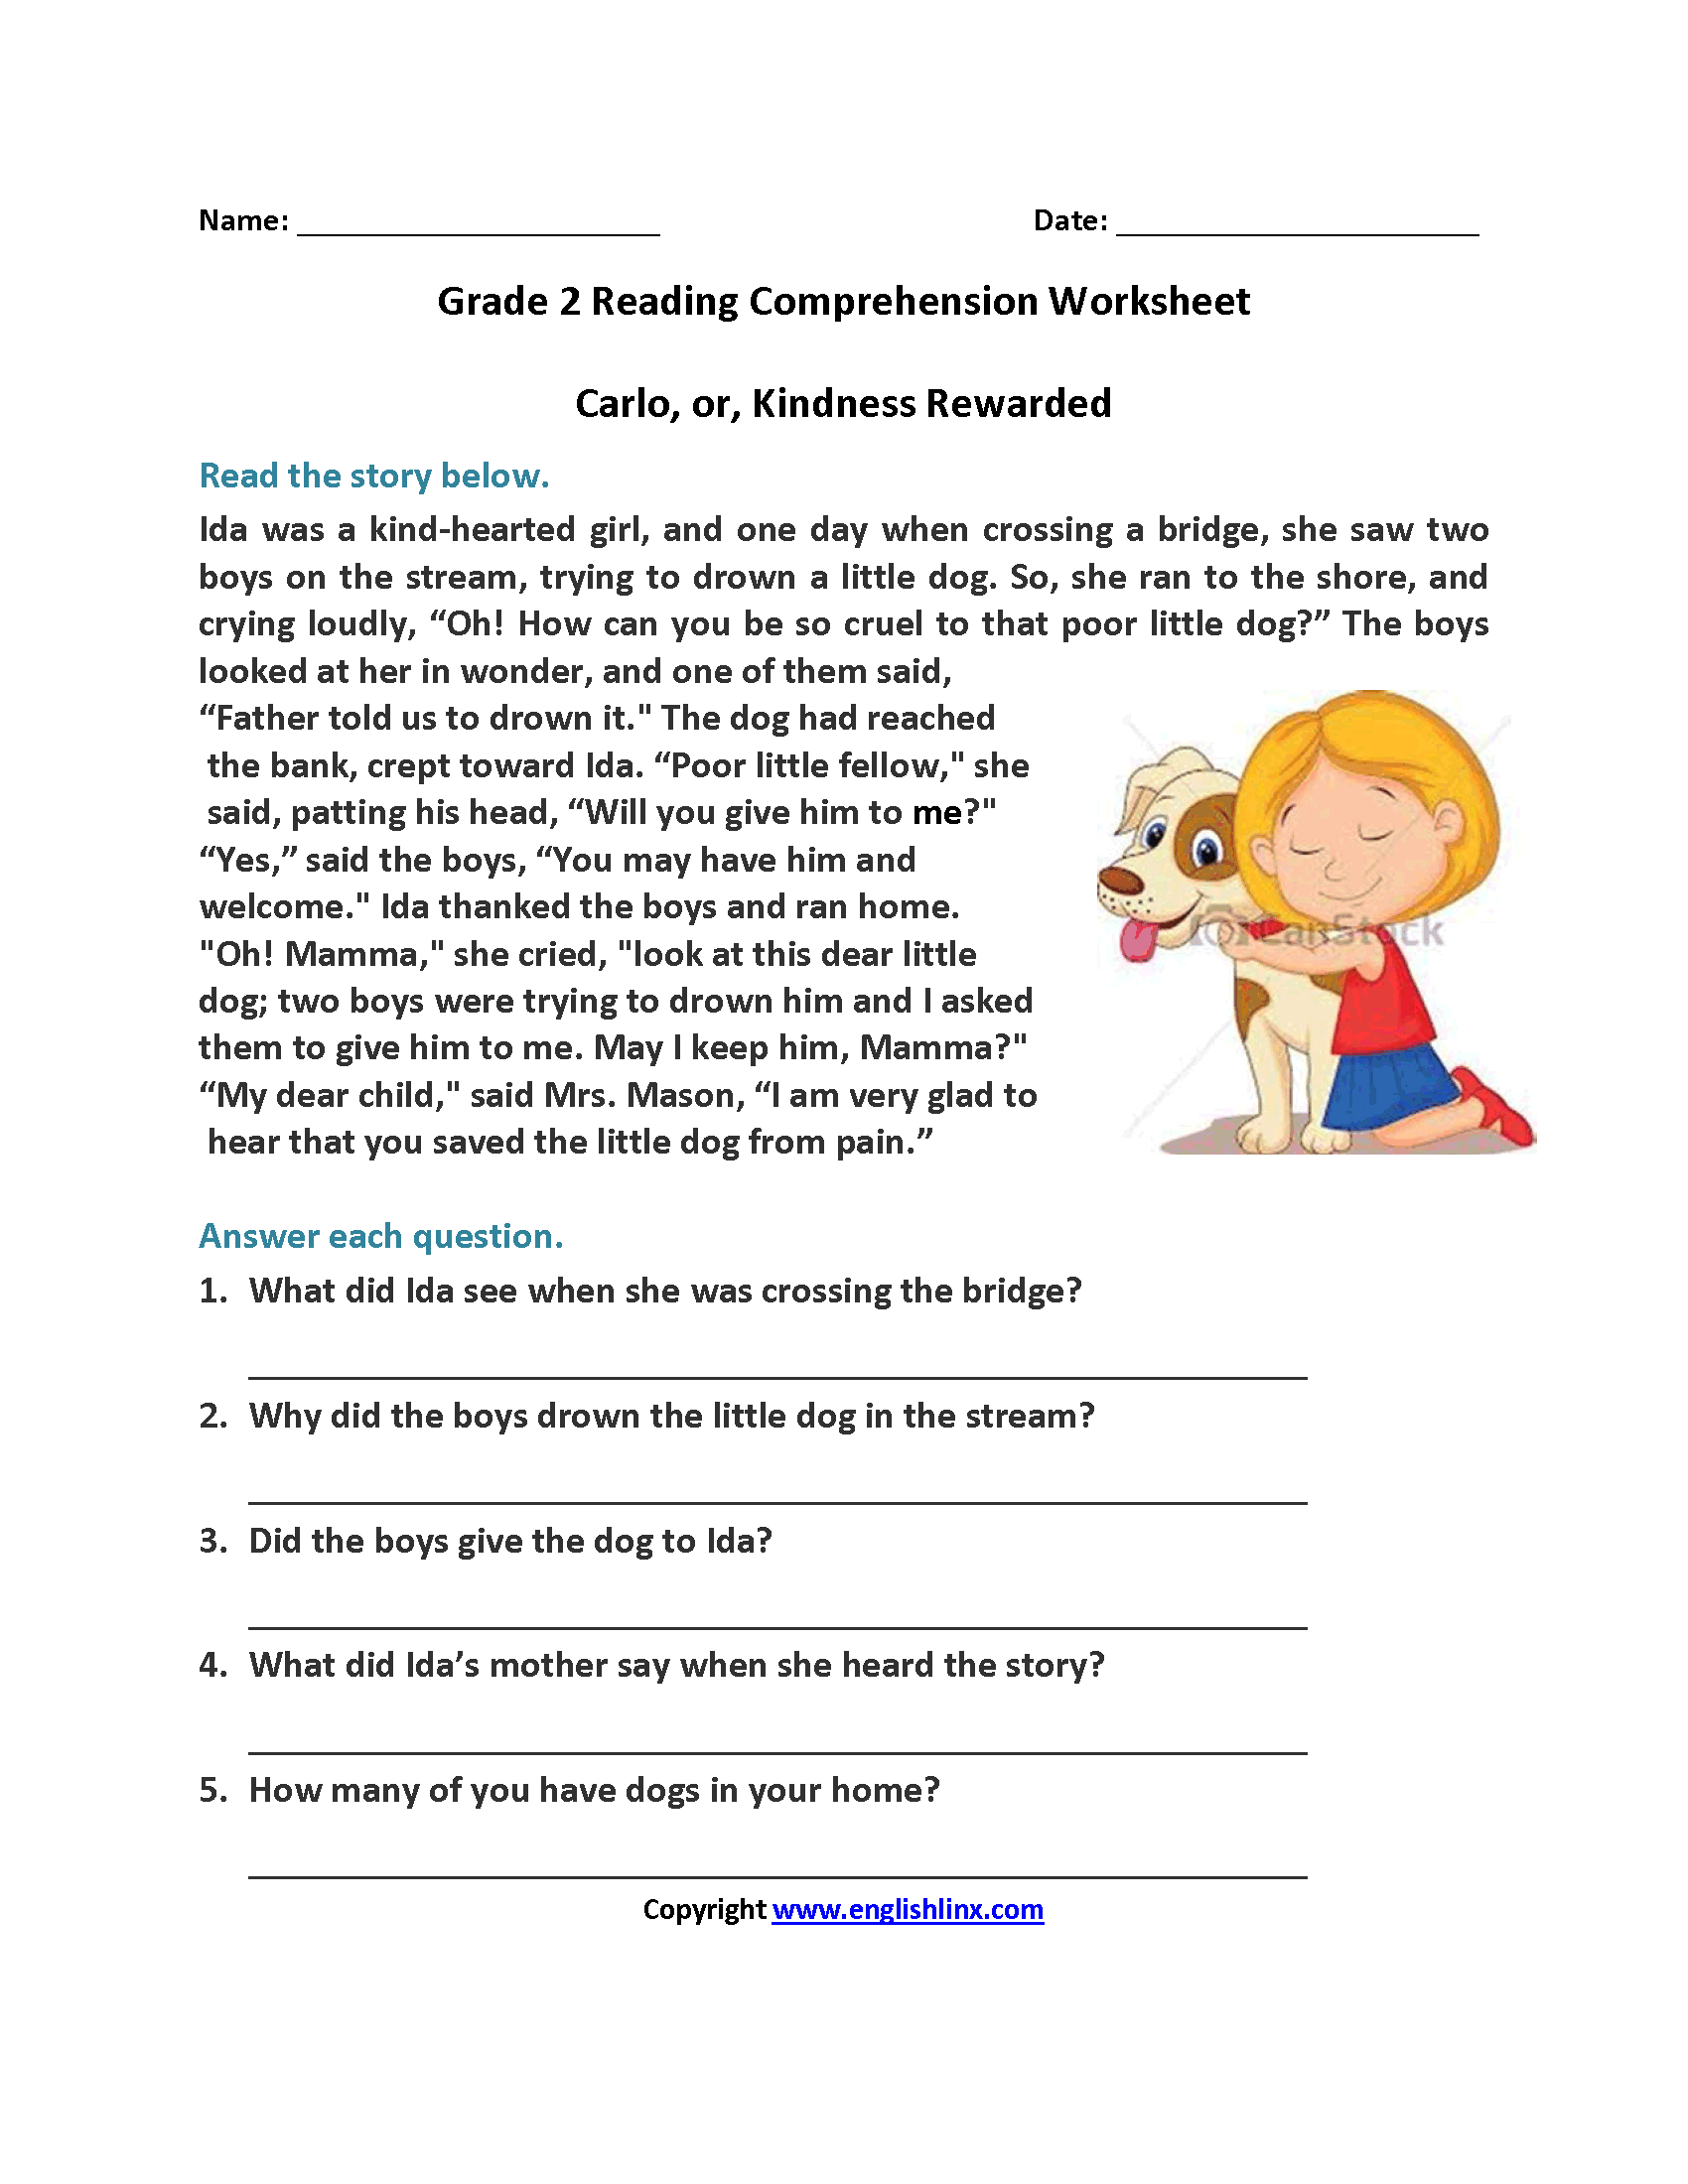 Carlo Or Kindness Rewarded Second Grade Reading Worksheets   Reading   Third Grade Reading Worksheets Free Printable